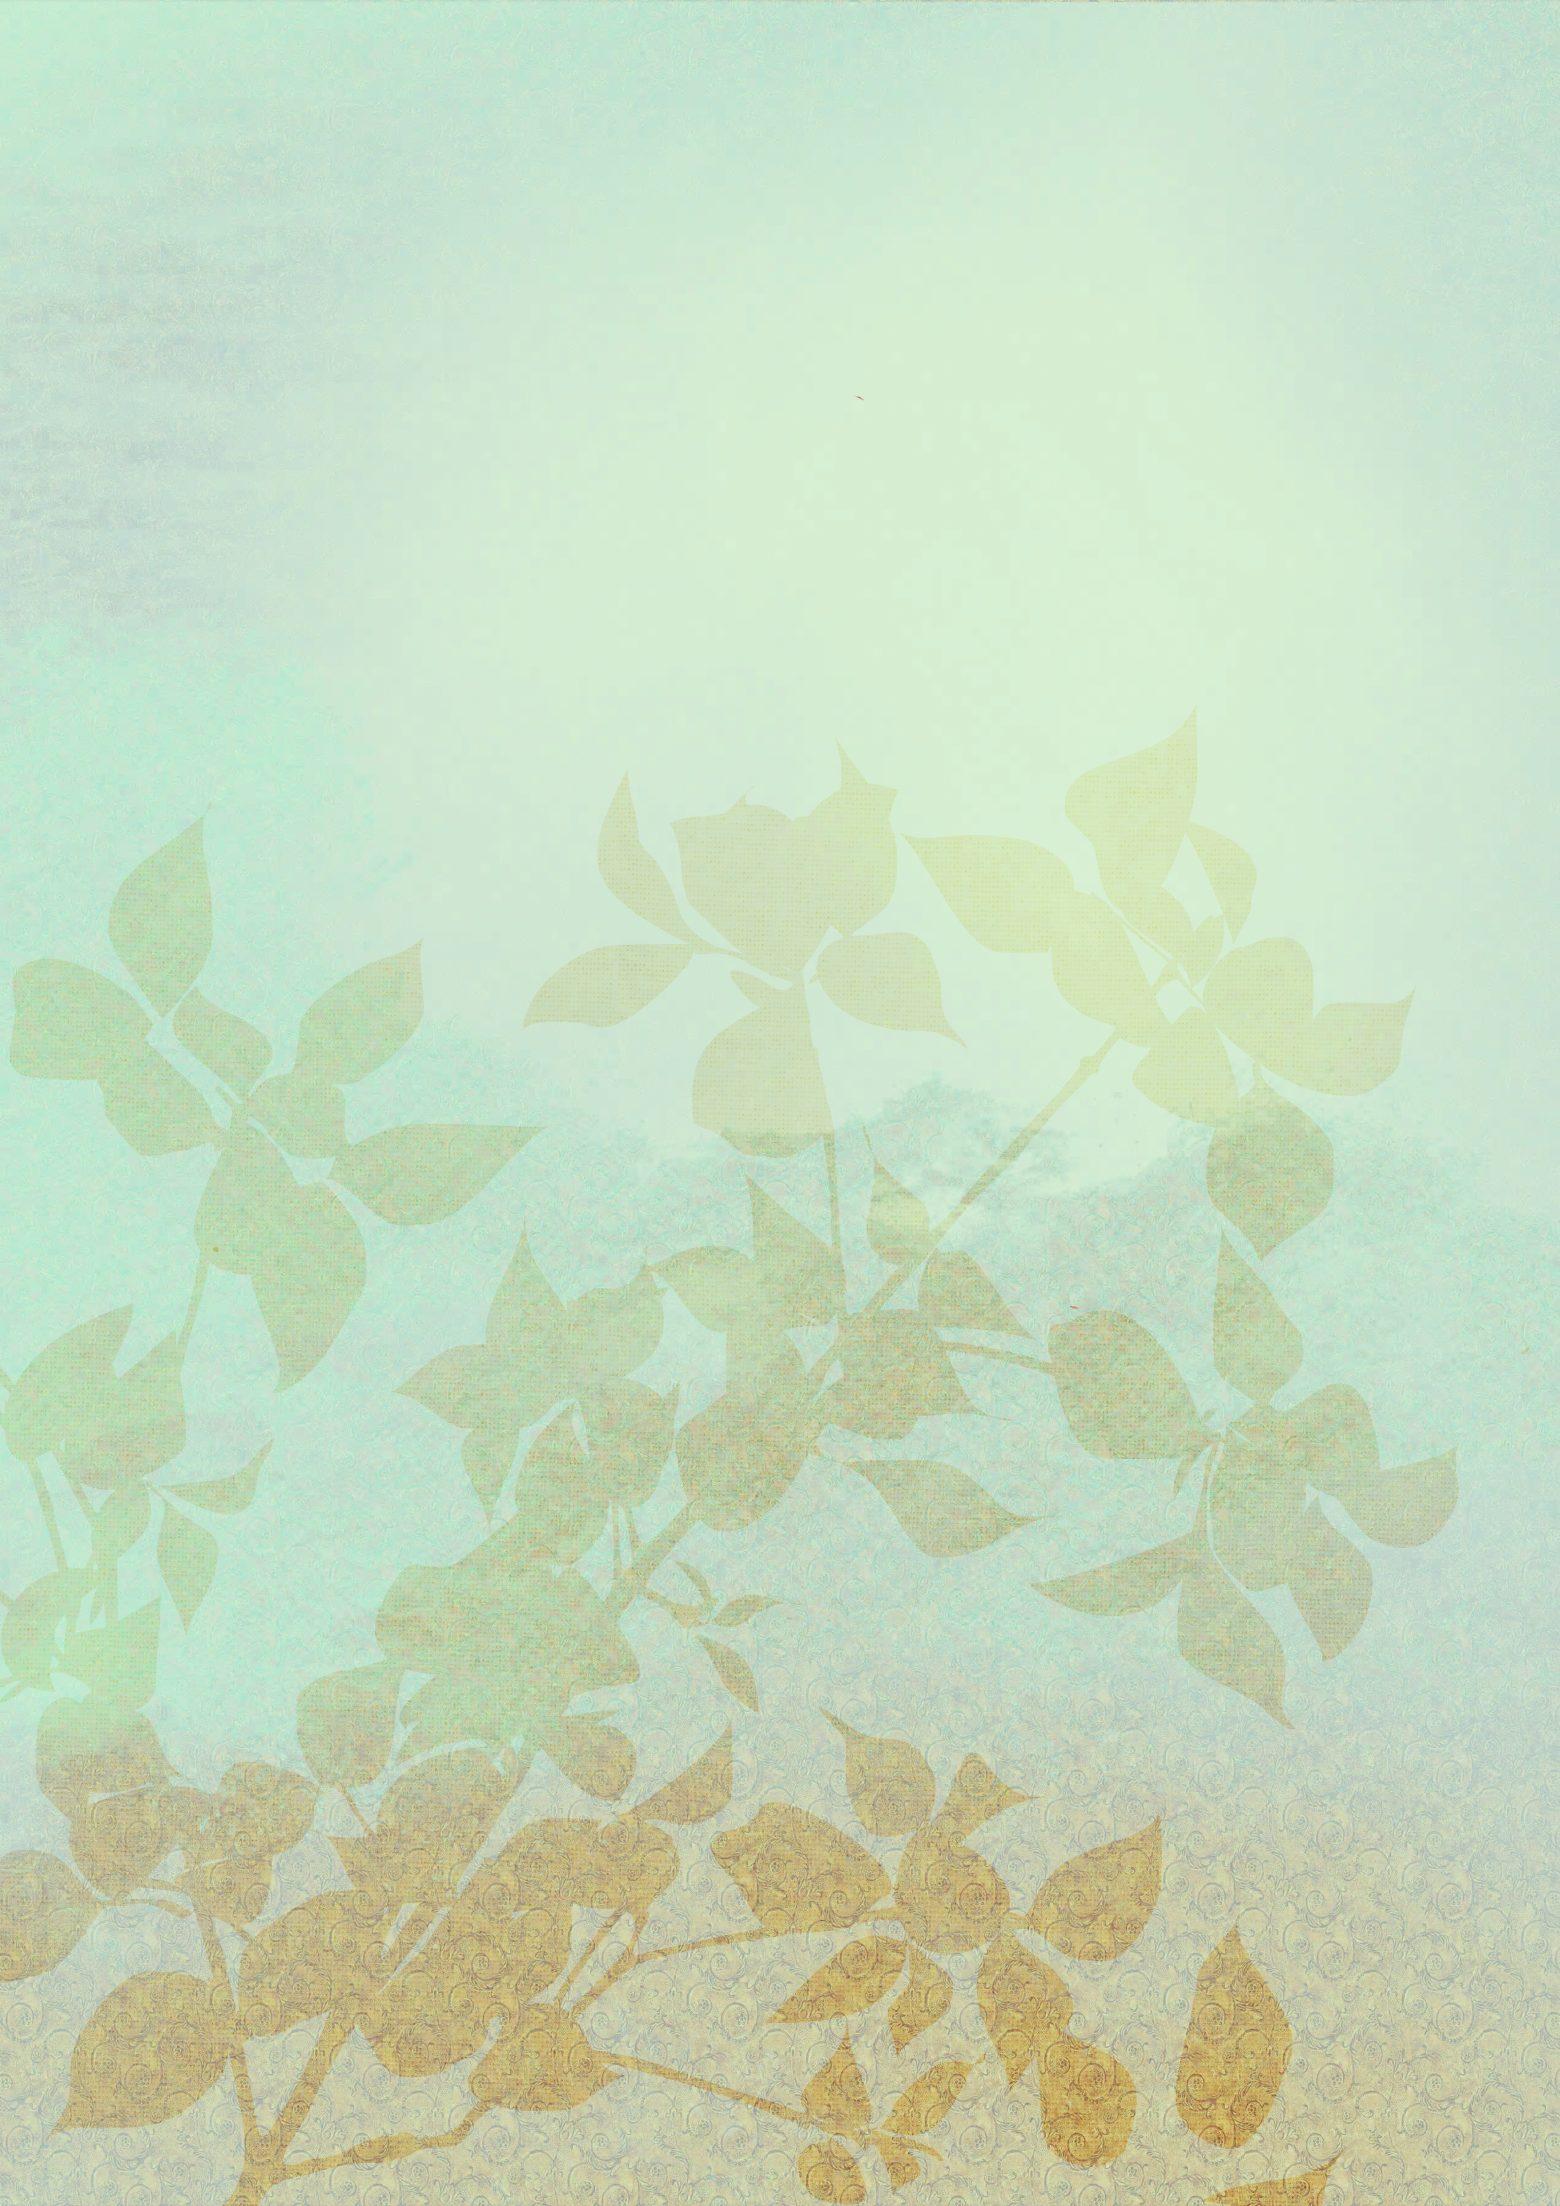 background-1151355